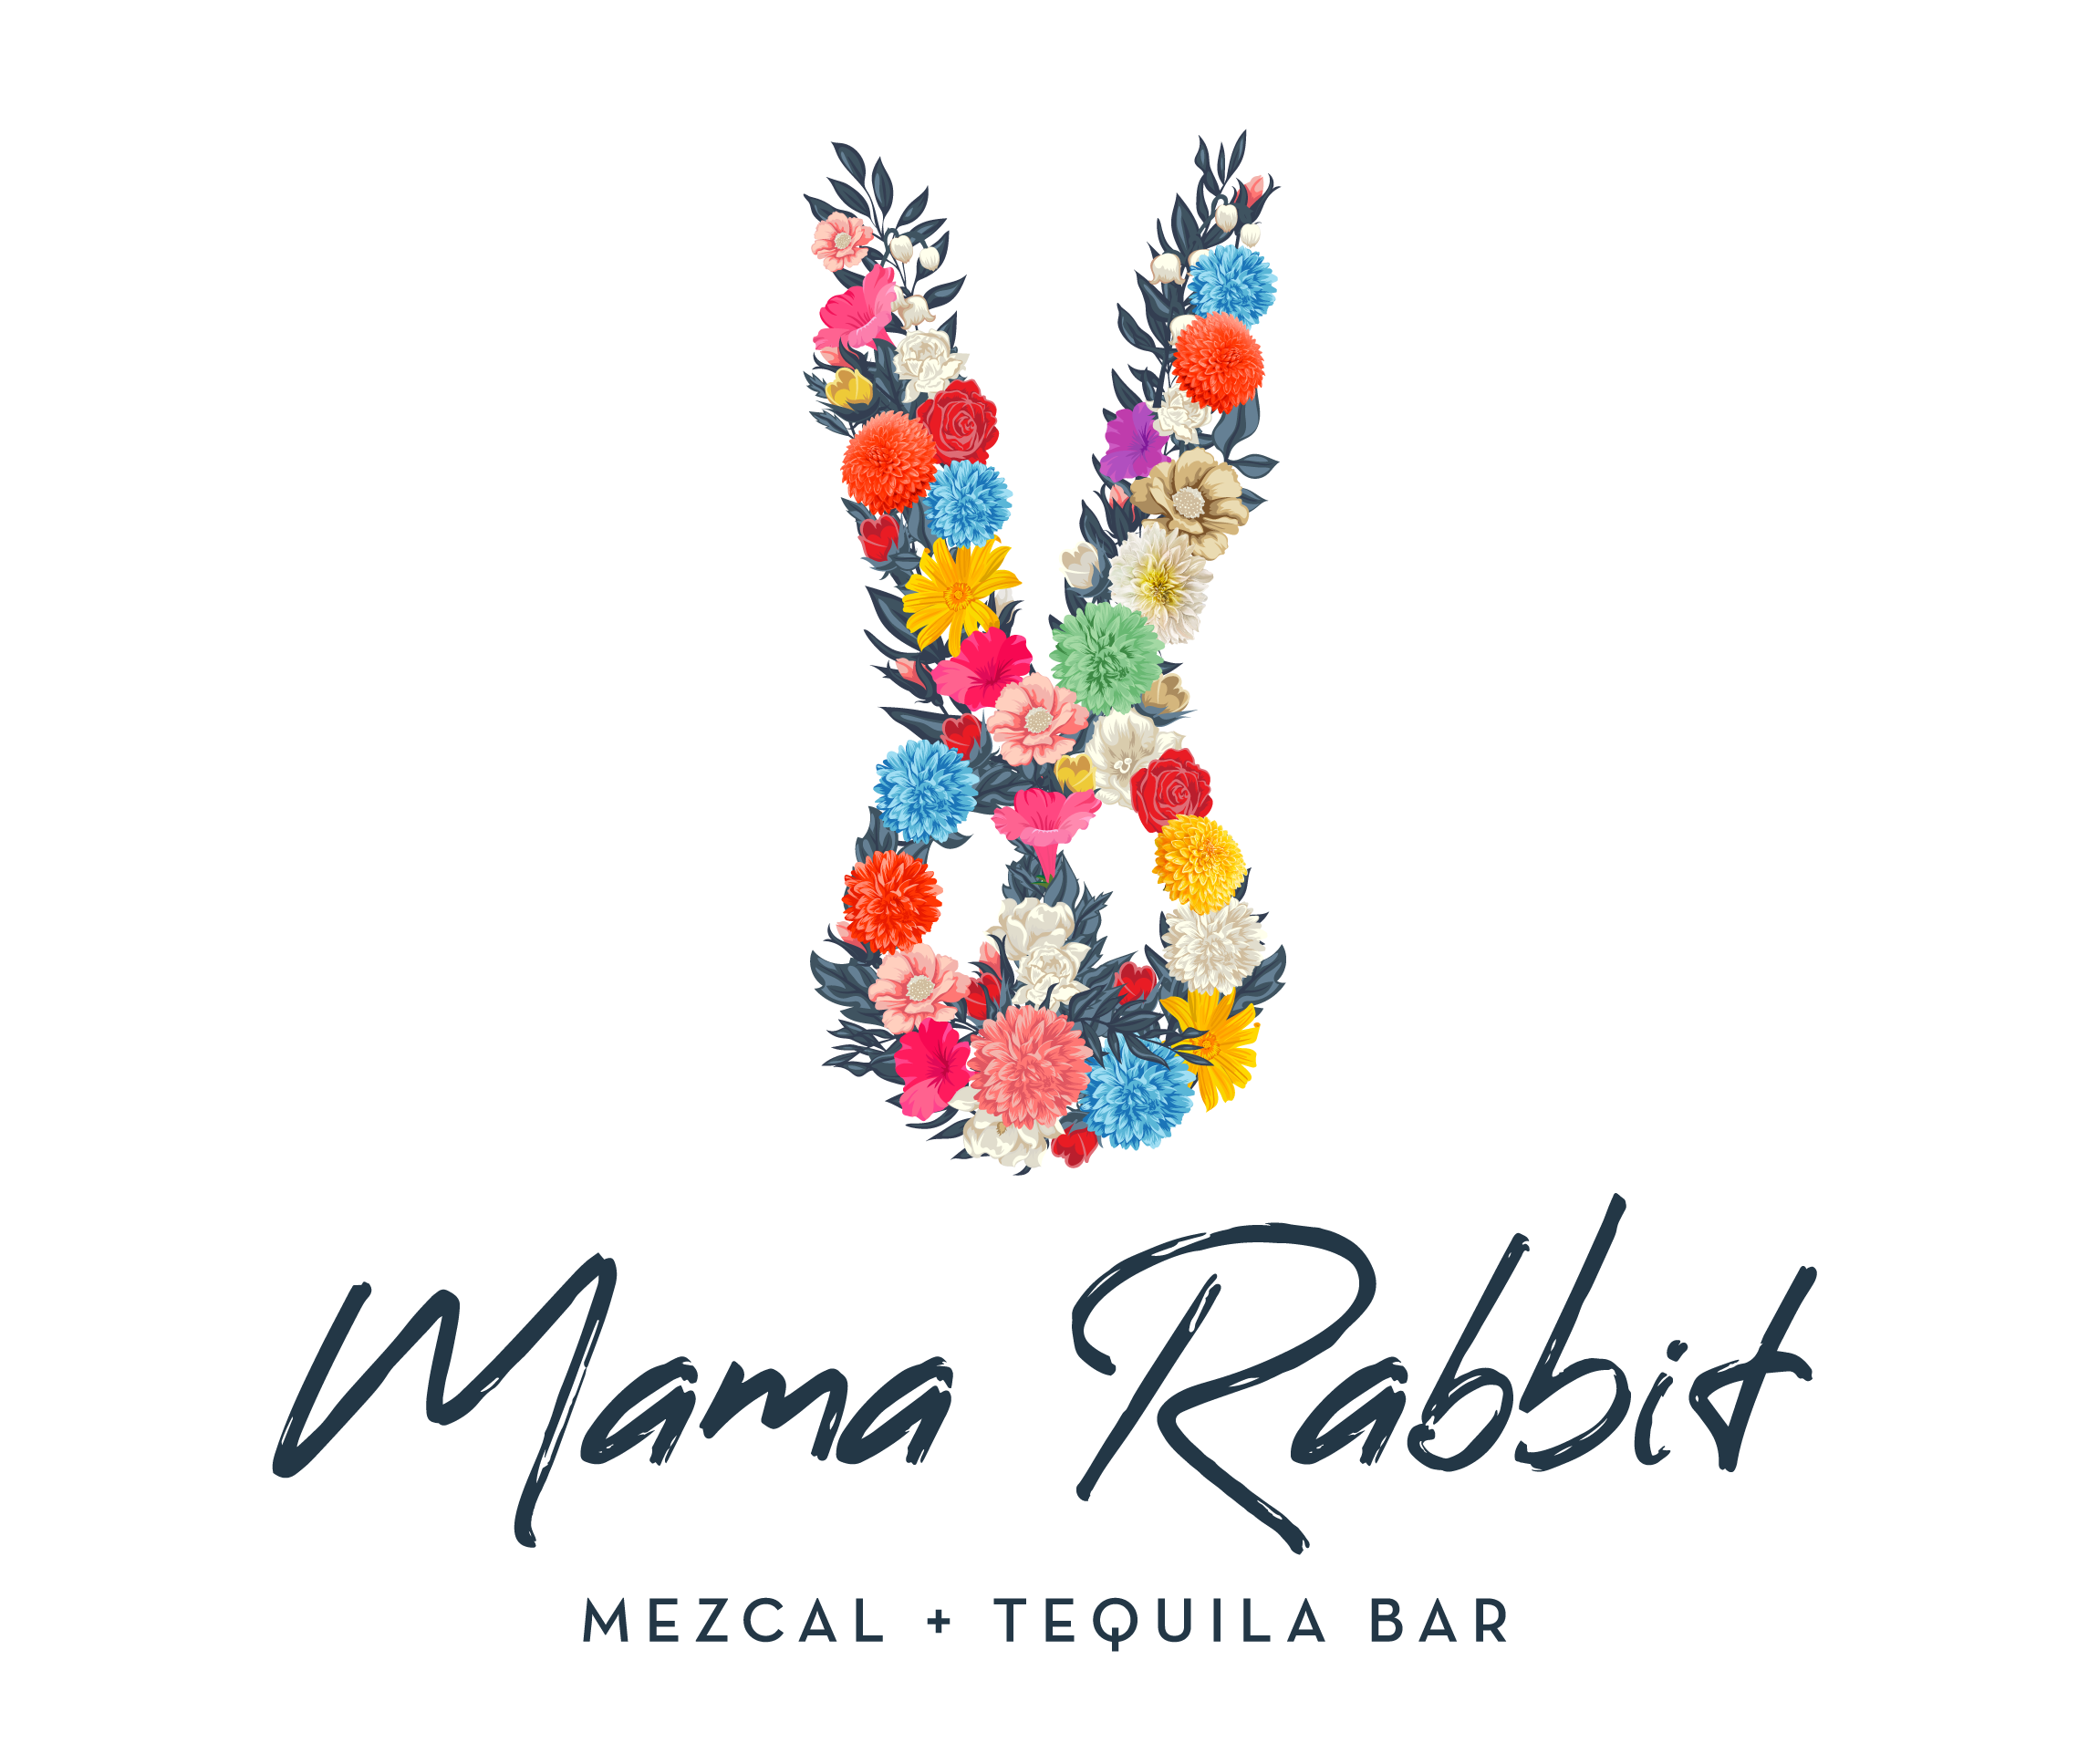 Mama-Rabbit-Mezcal-+-Tequila-Bar-Logo.png